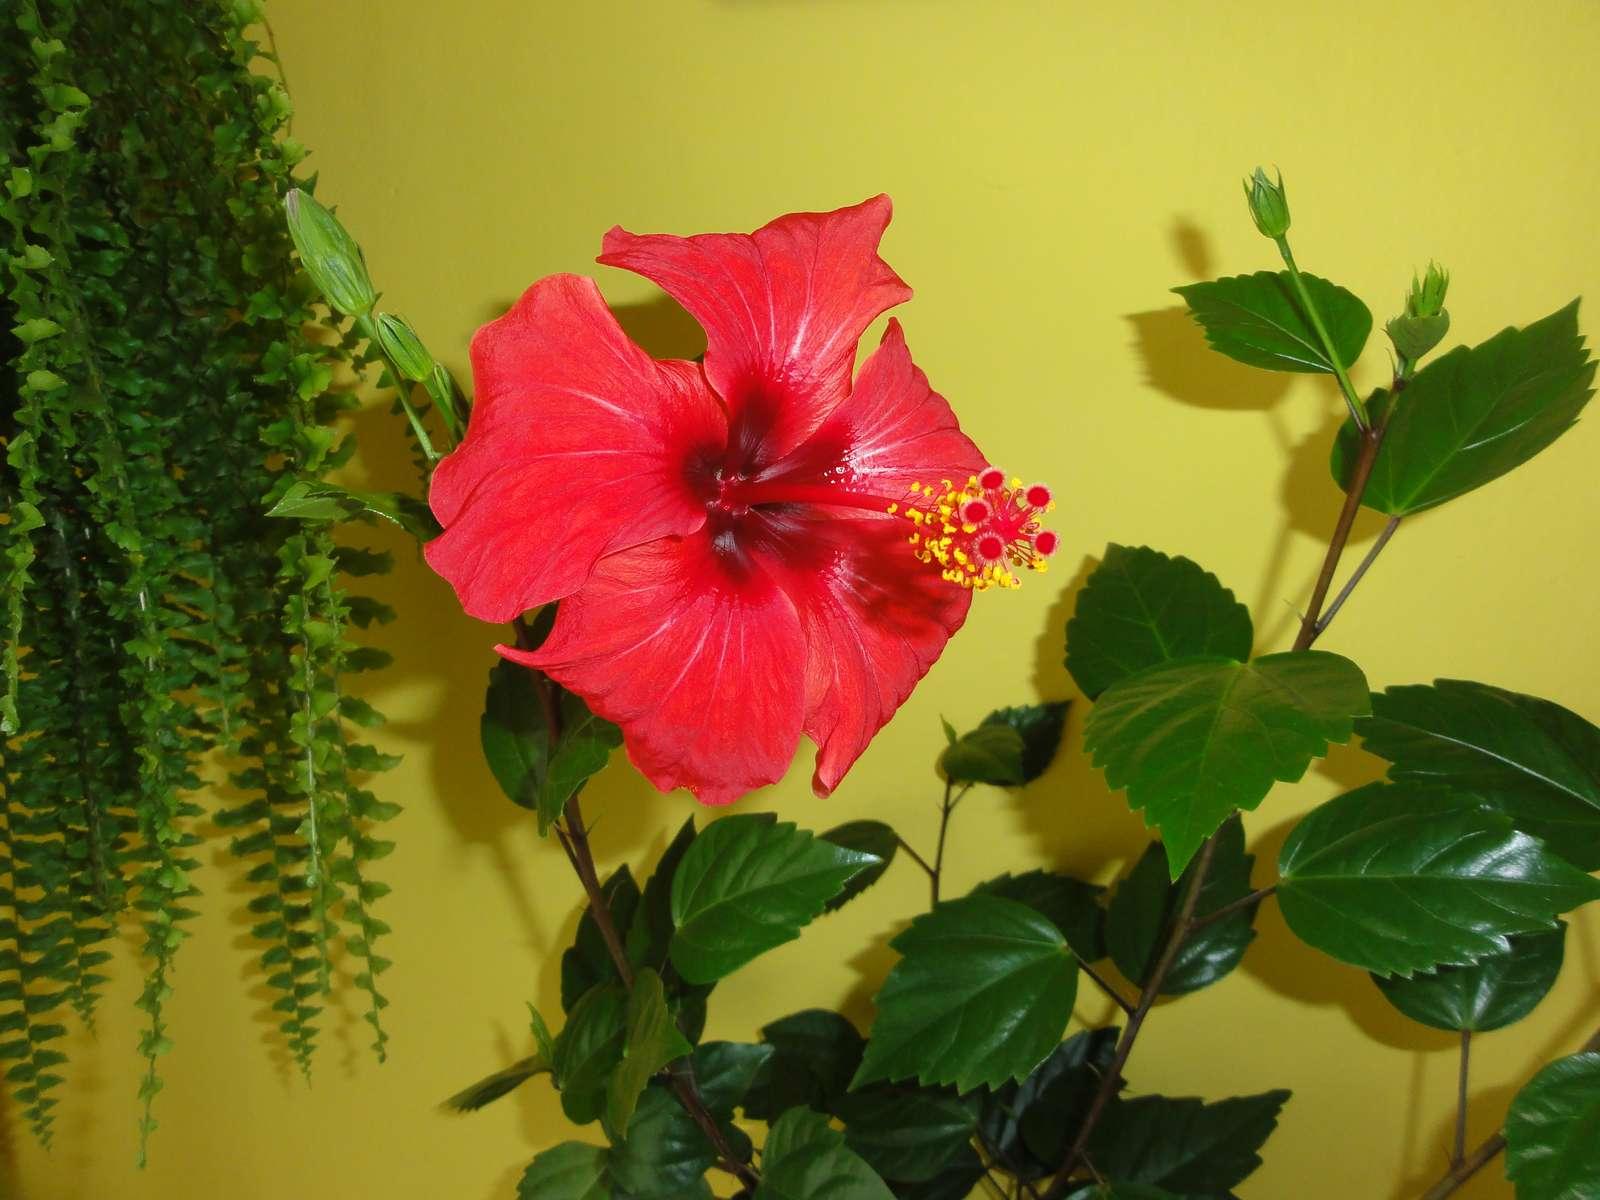 Čínska ruža /ibištek čínsky/ - Obrázok č. 1